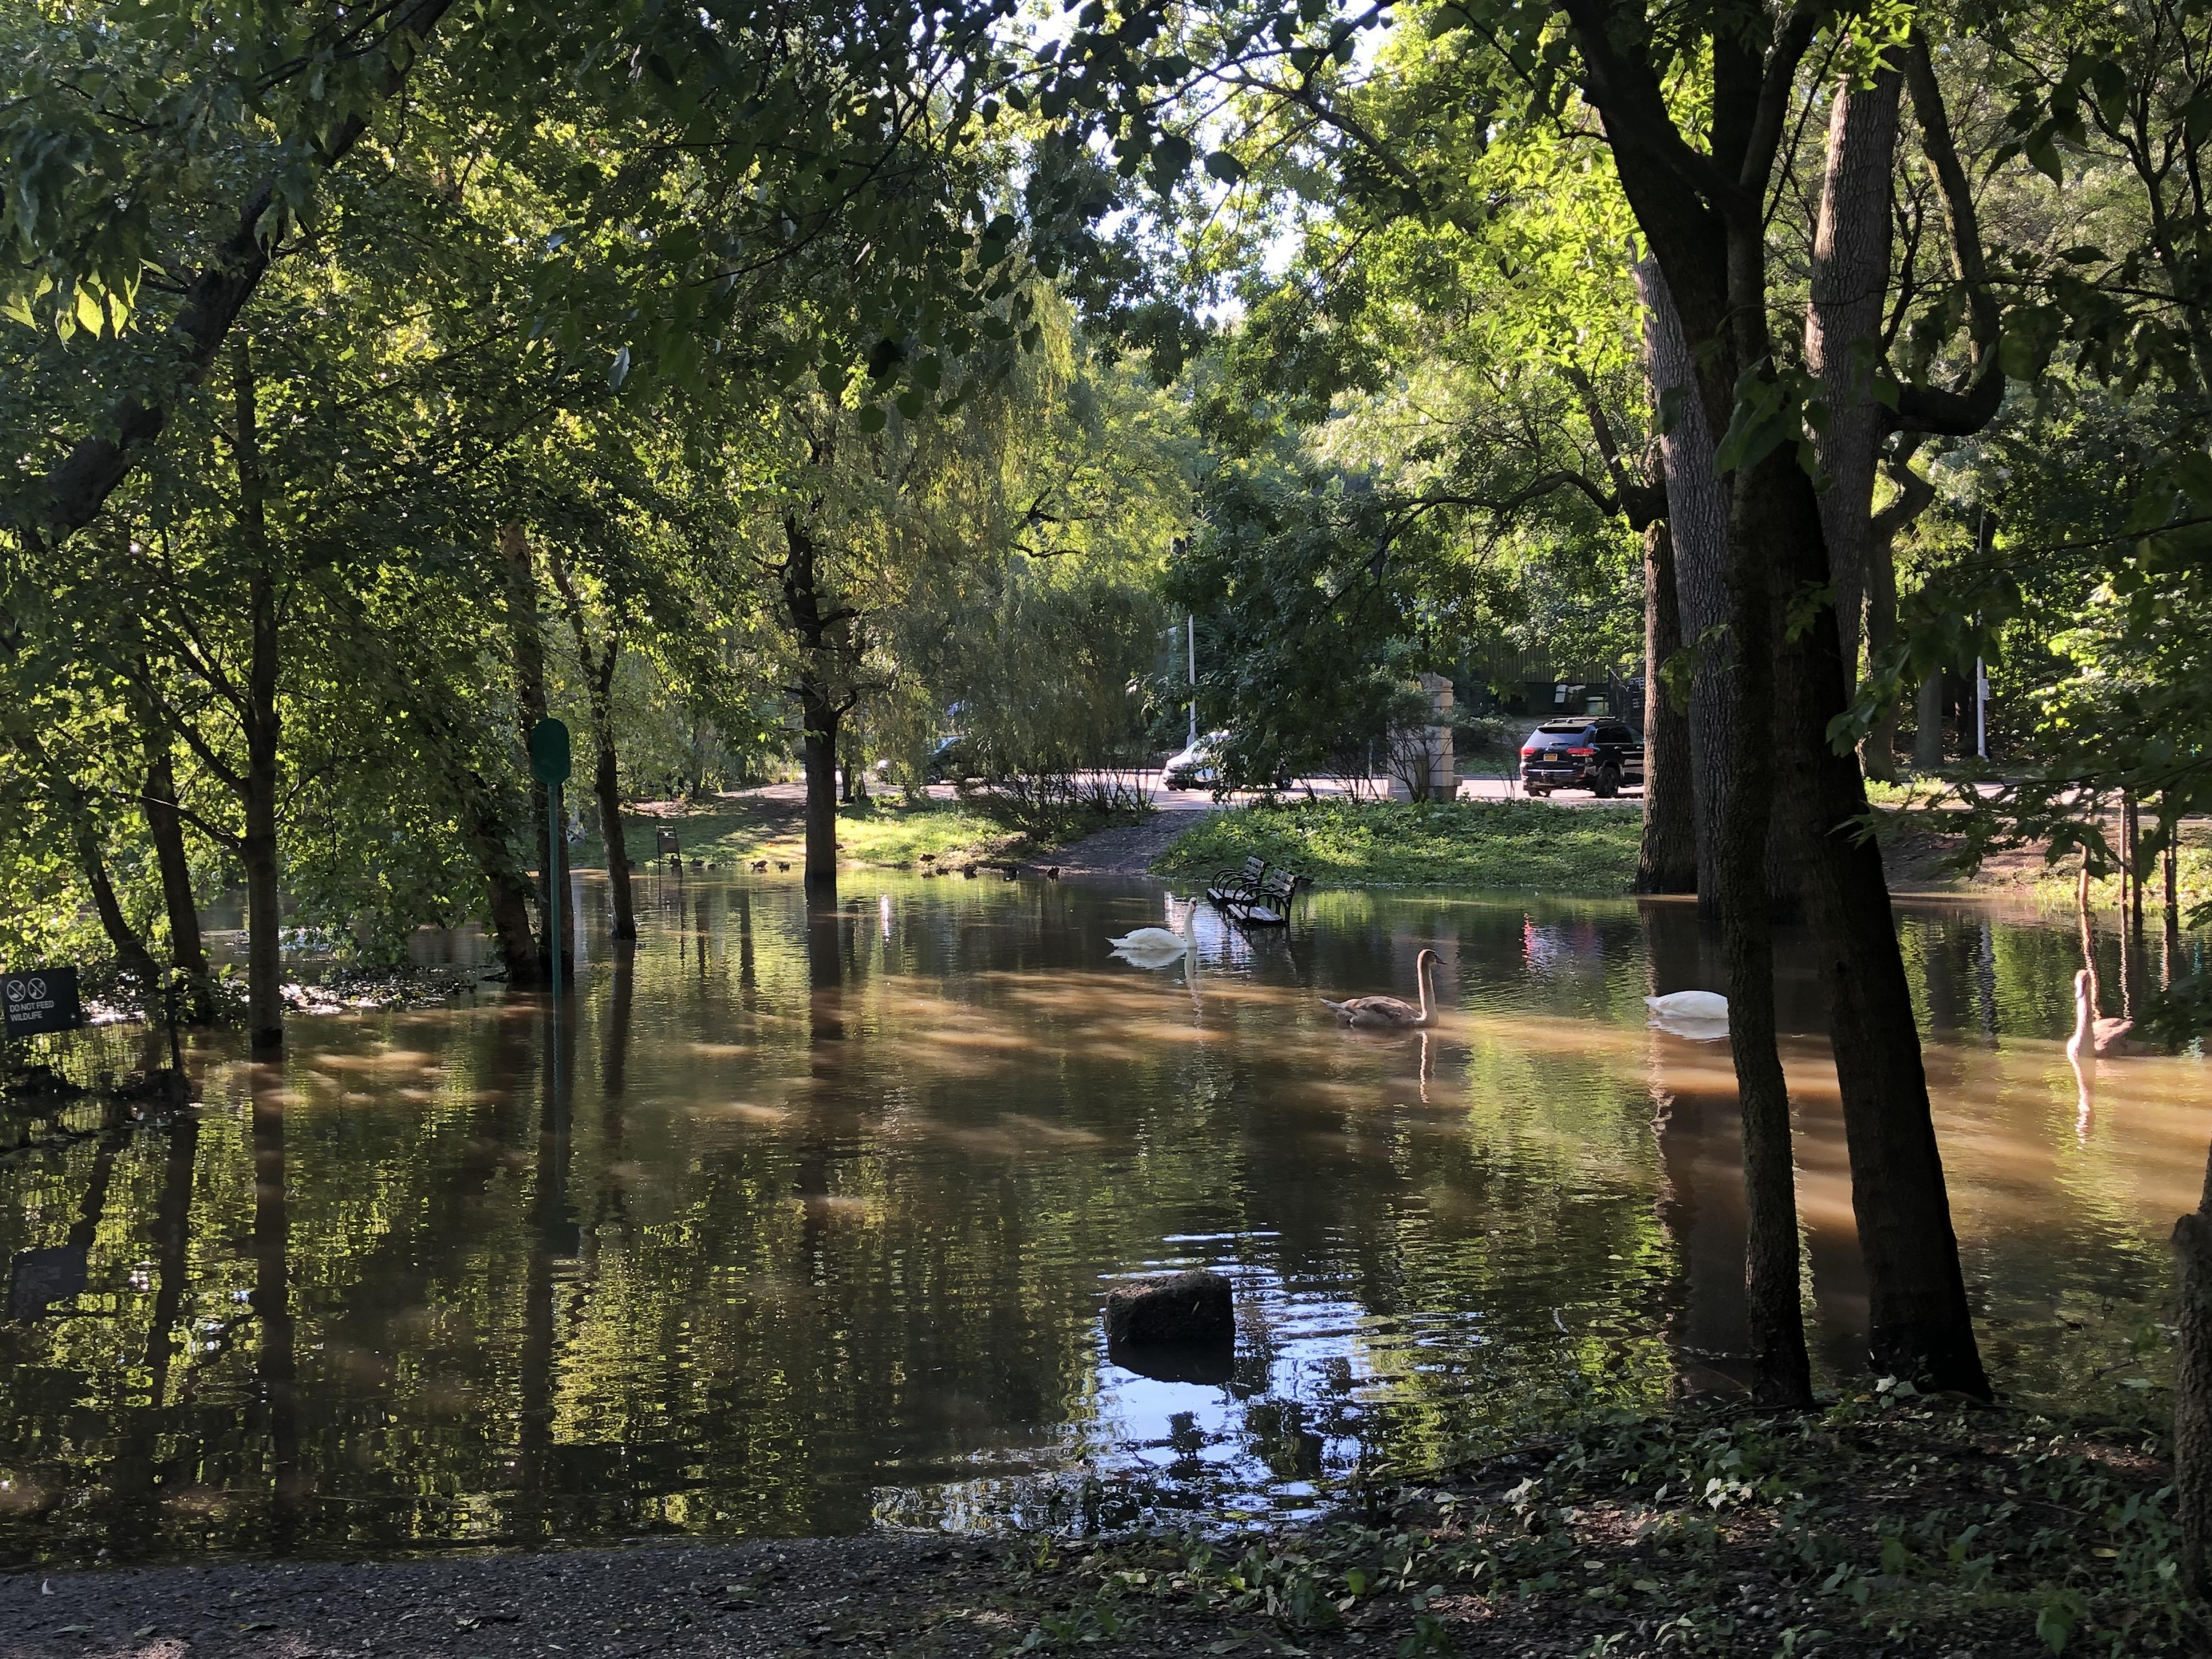 Van Cort. Lake (see bench)